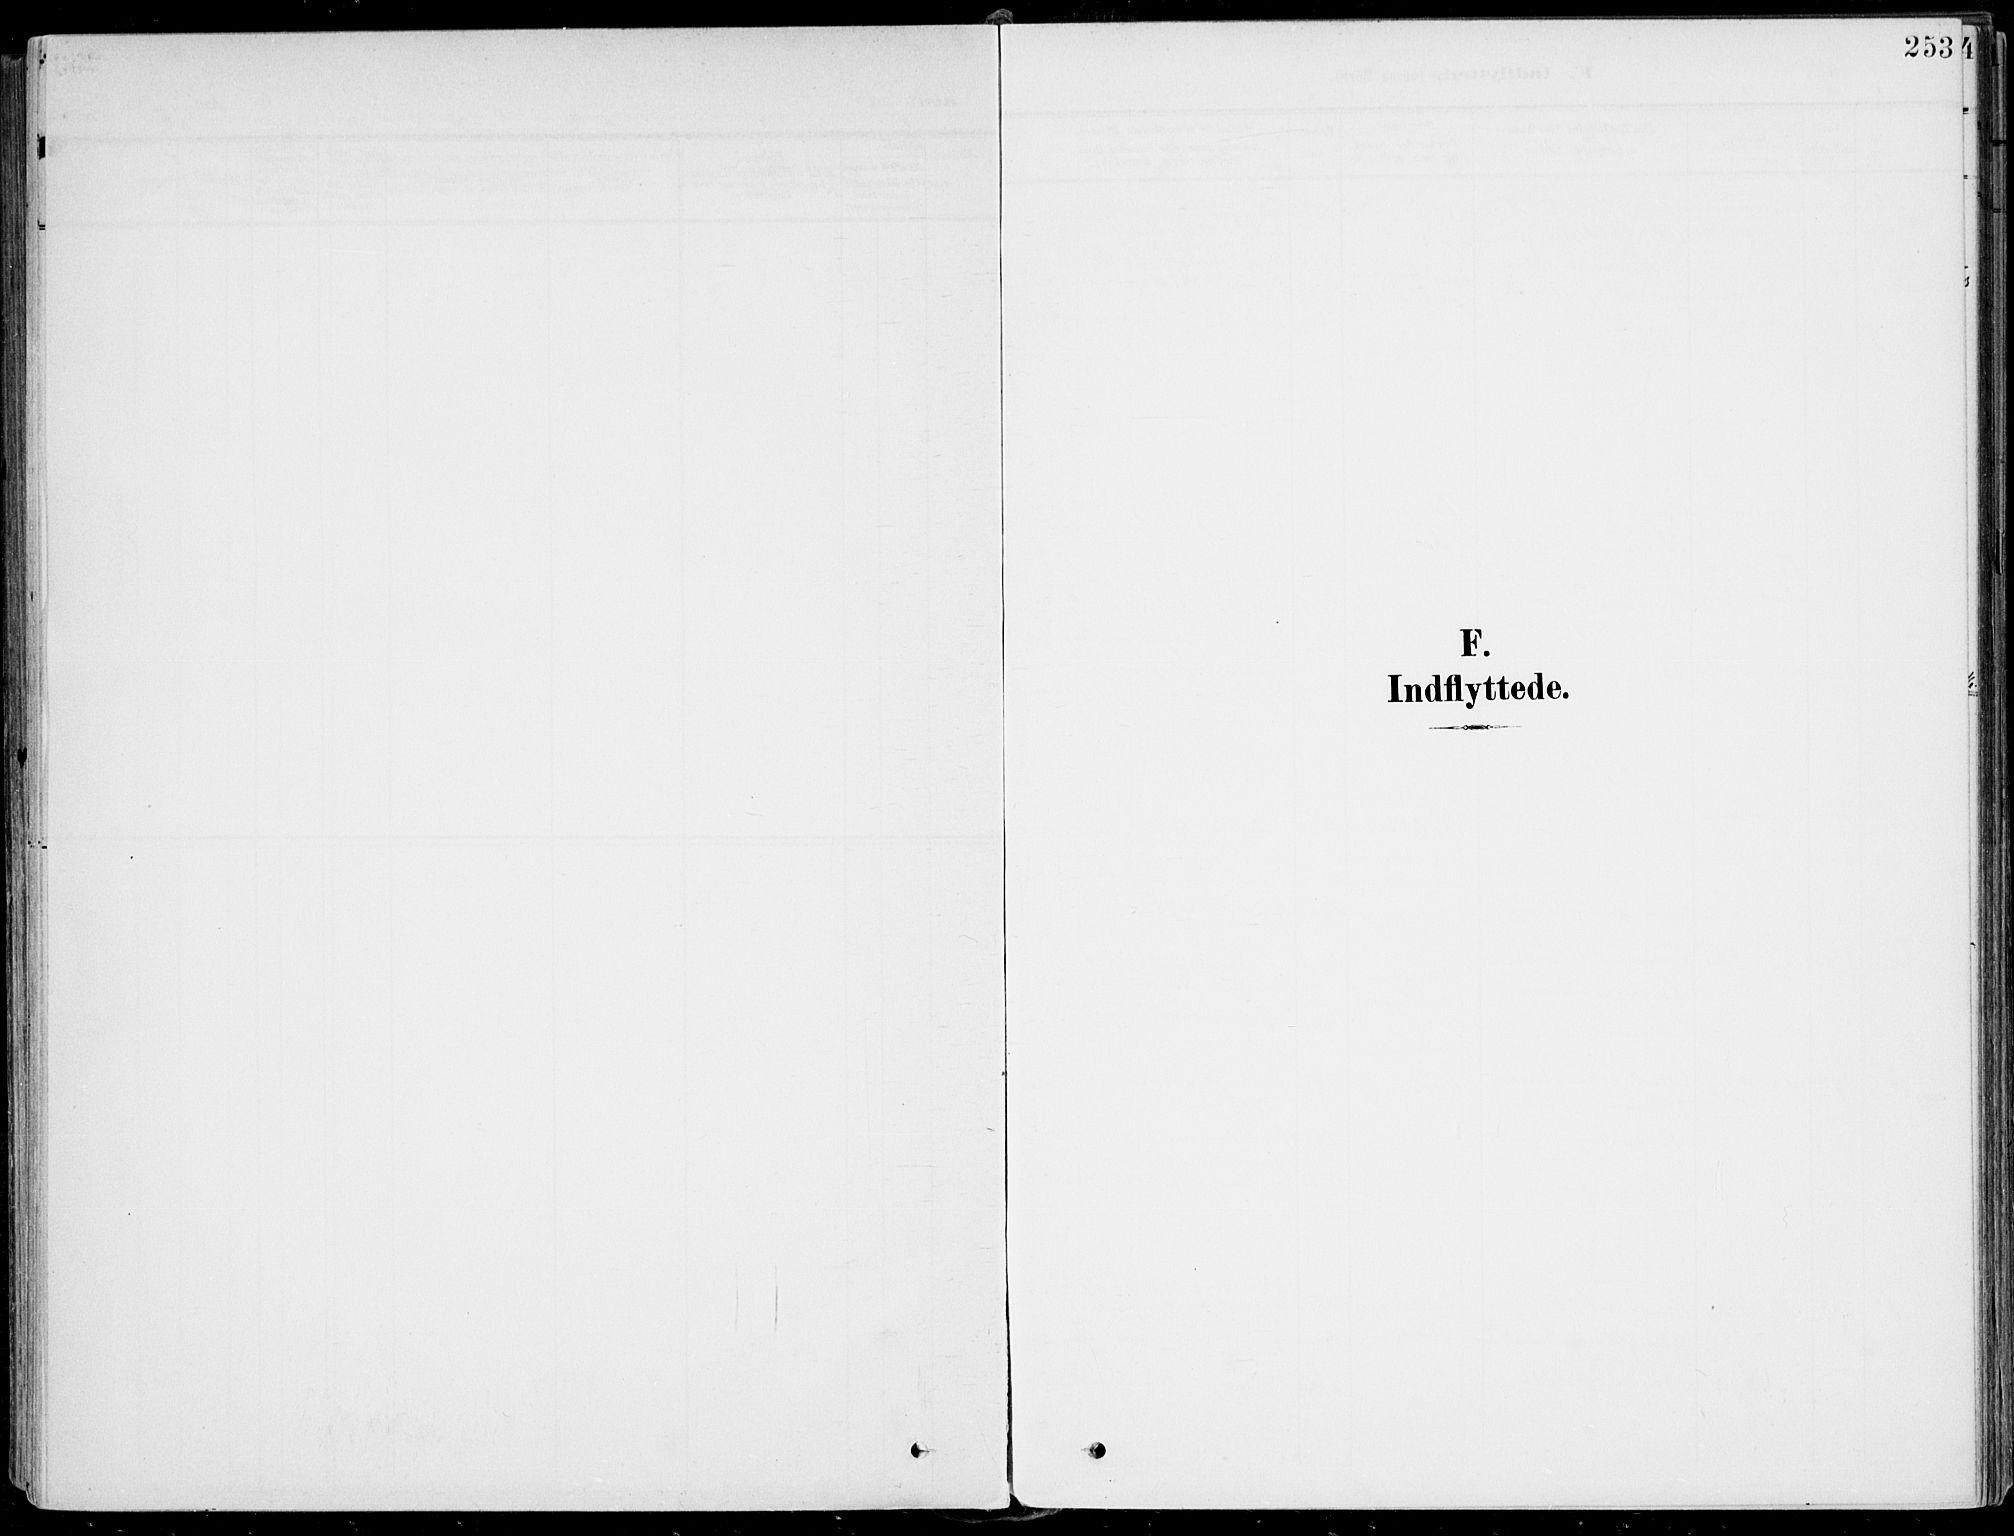 SAKO, Sigdal kirkebøker, F/Fb/L0002: Ministerialbok nr. II 2, 1901-1914, s. 253